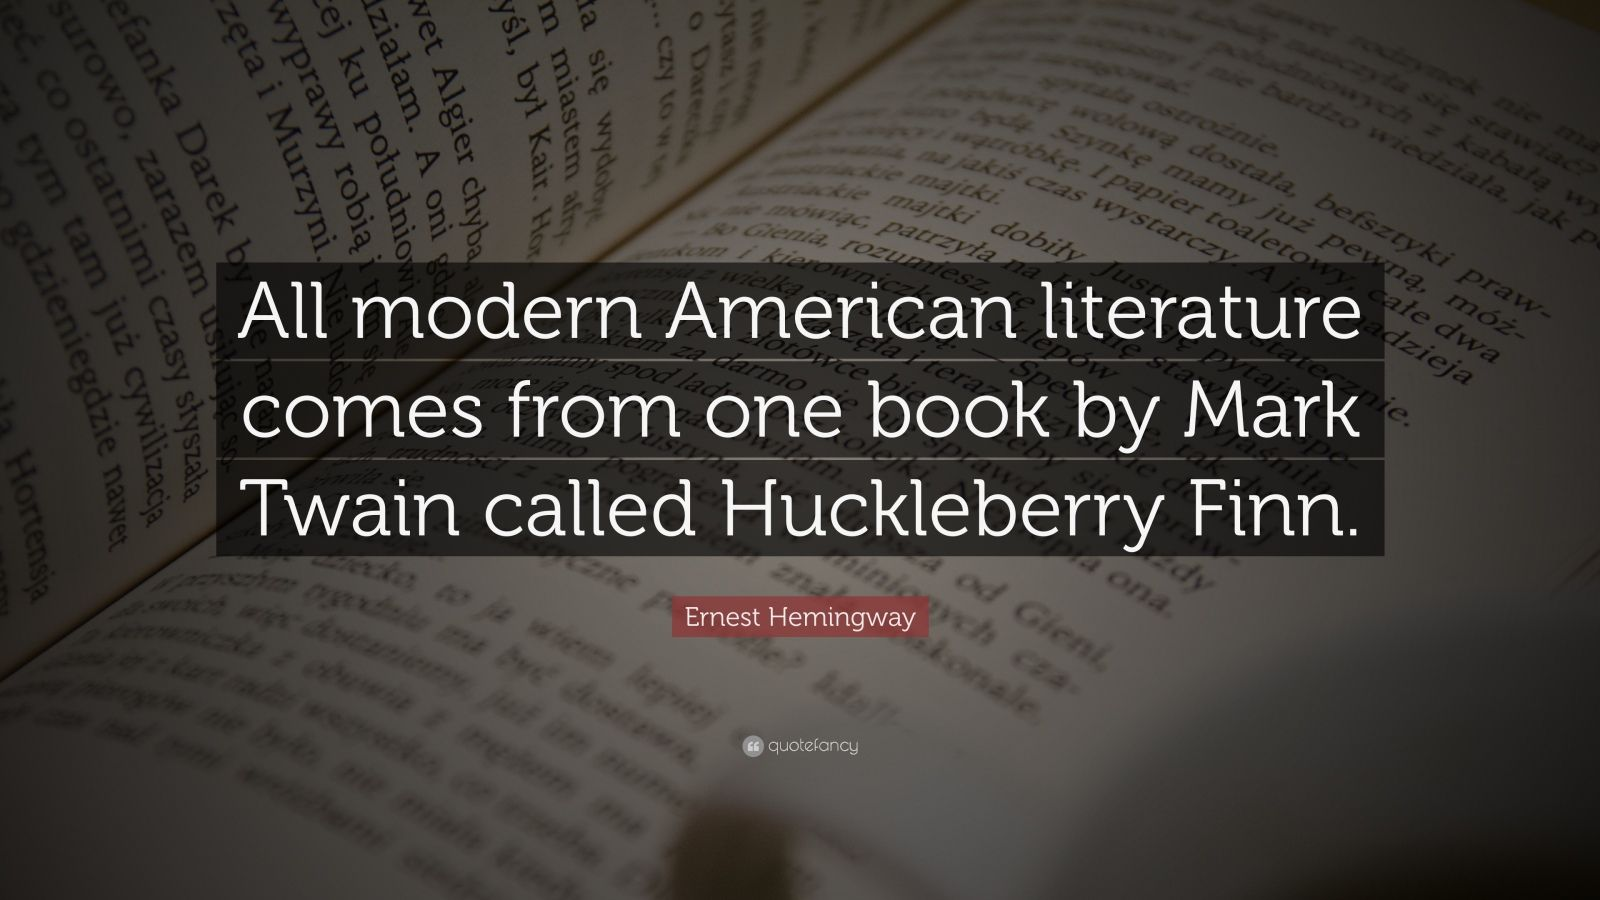 Huckleberry finns impact on modern american literature essay